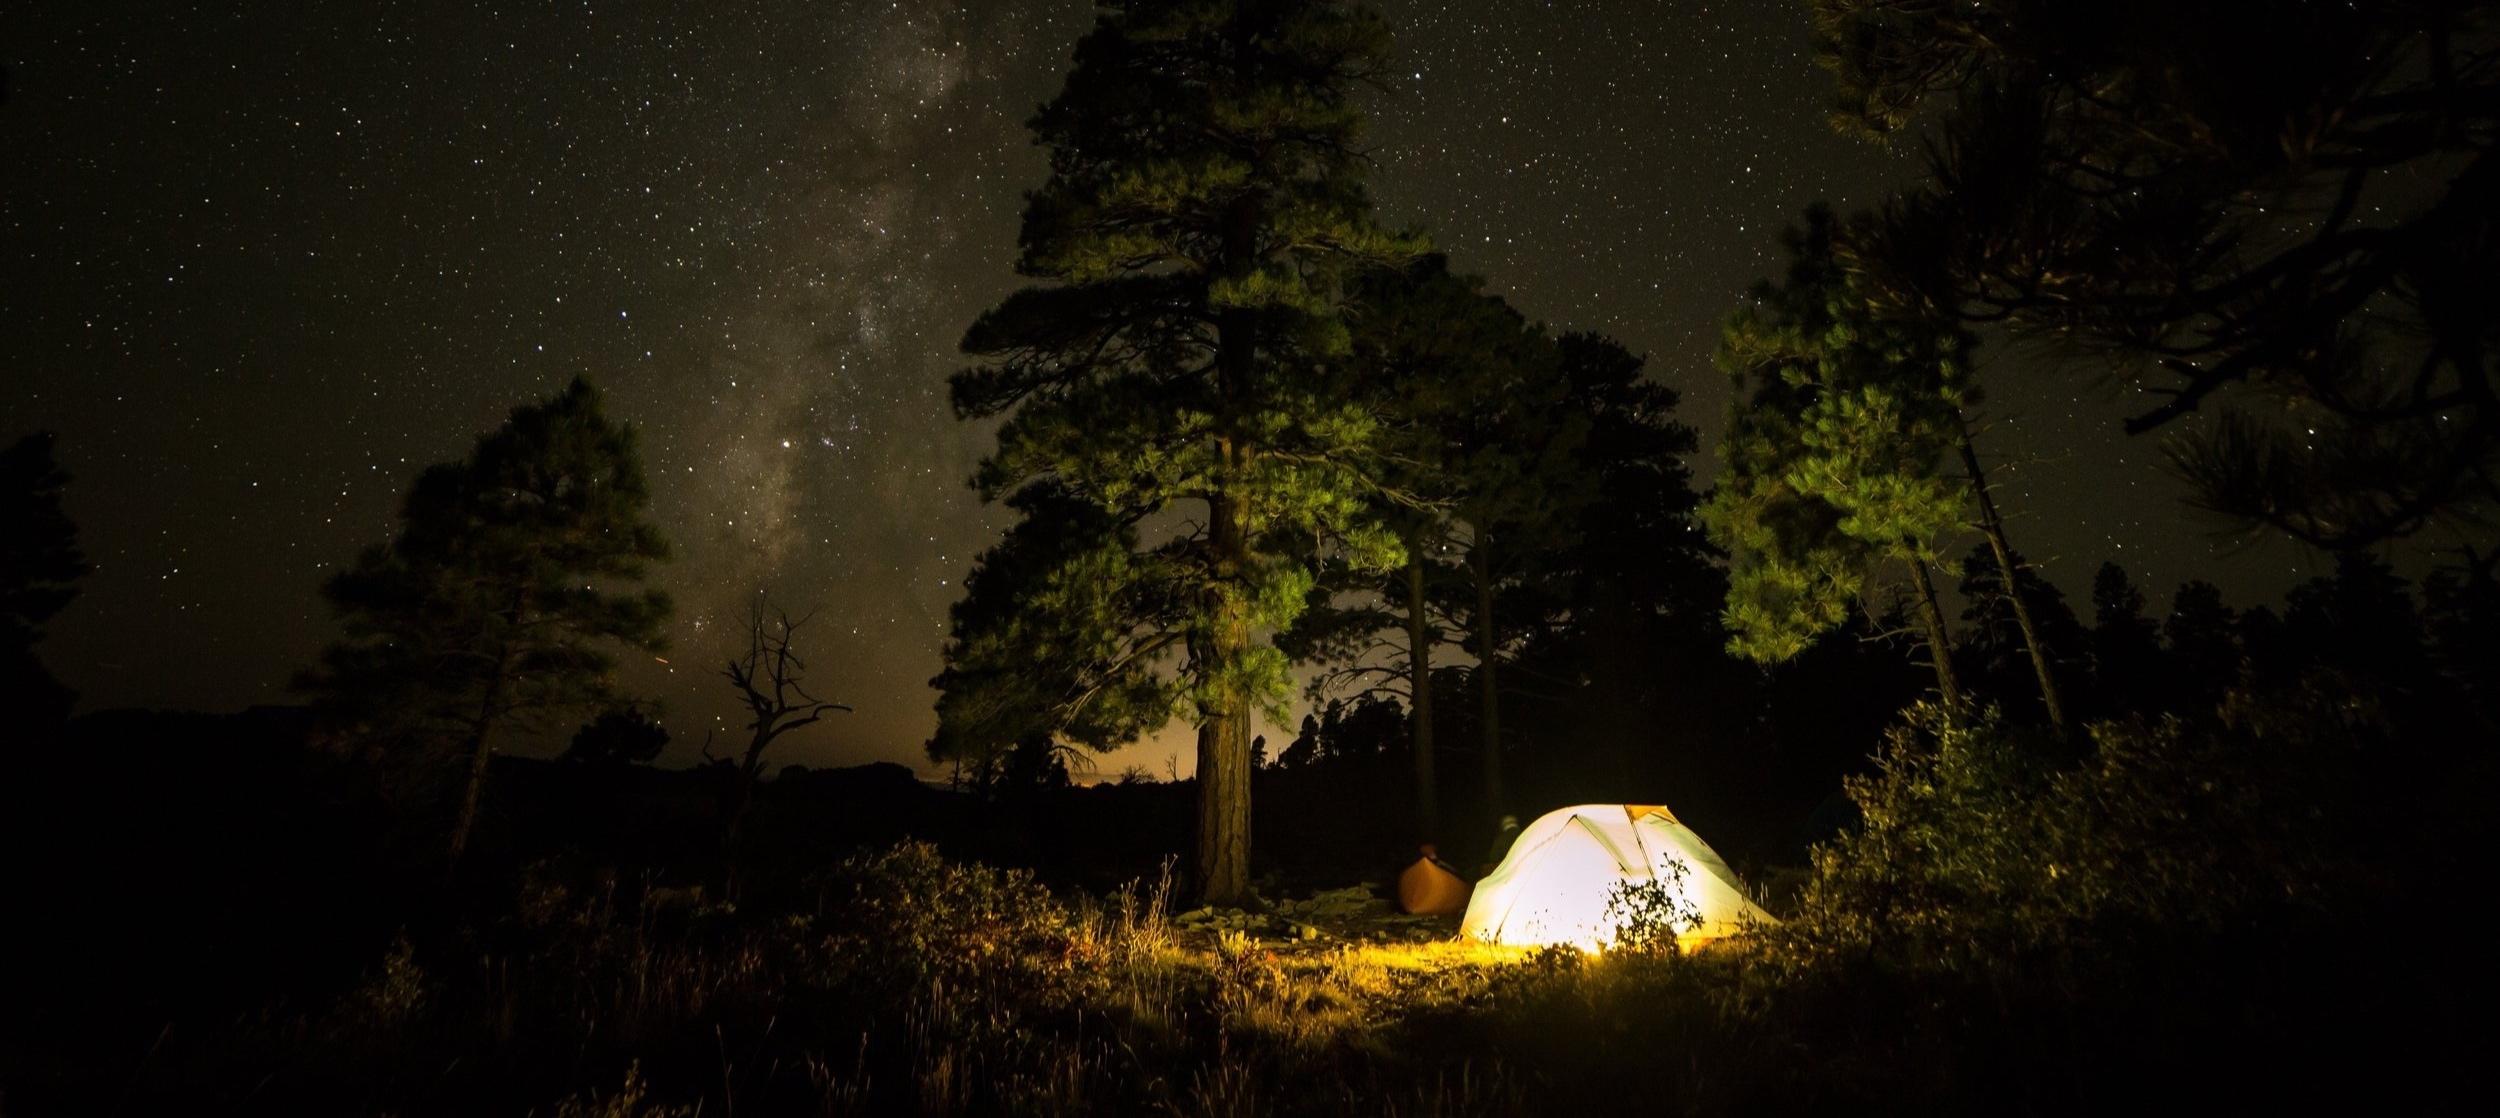 Awaken in nature -